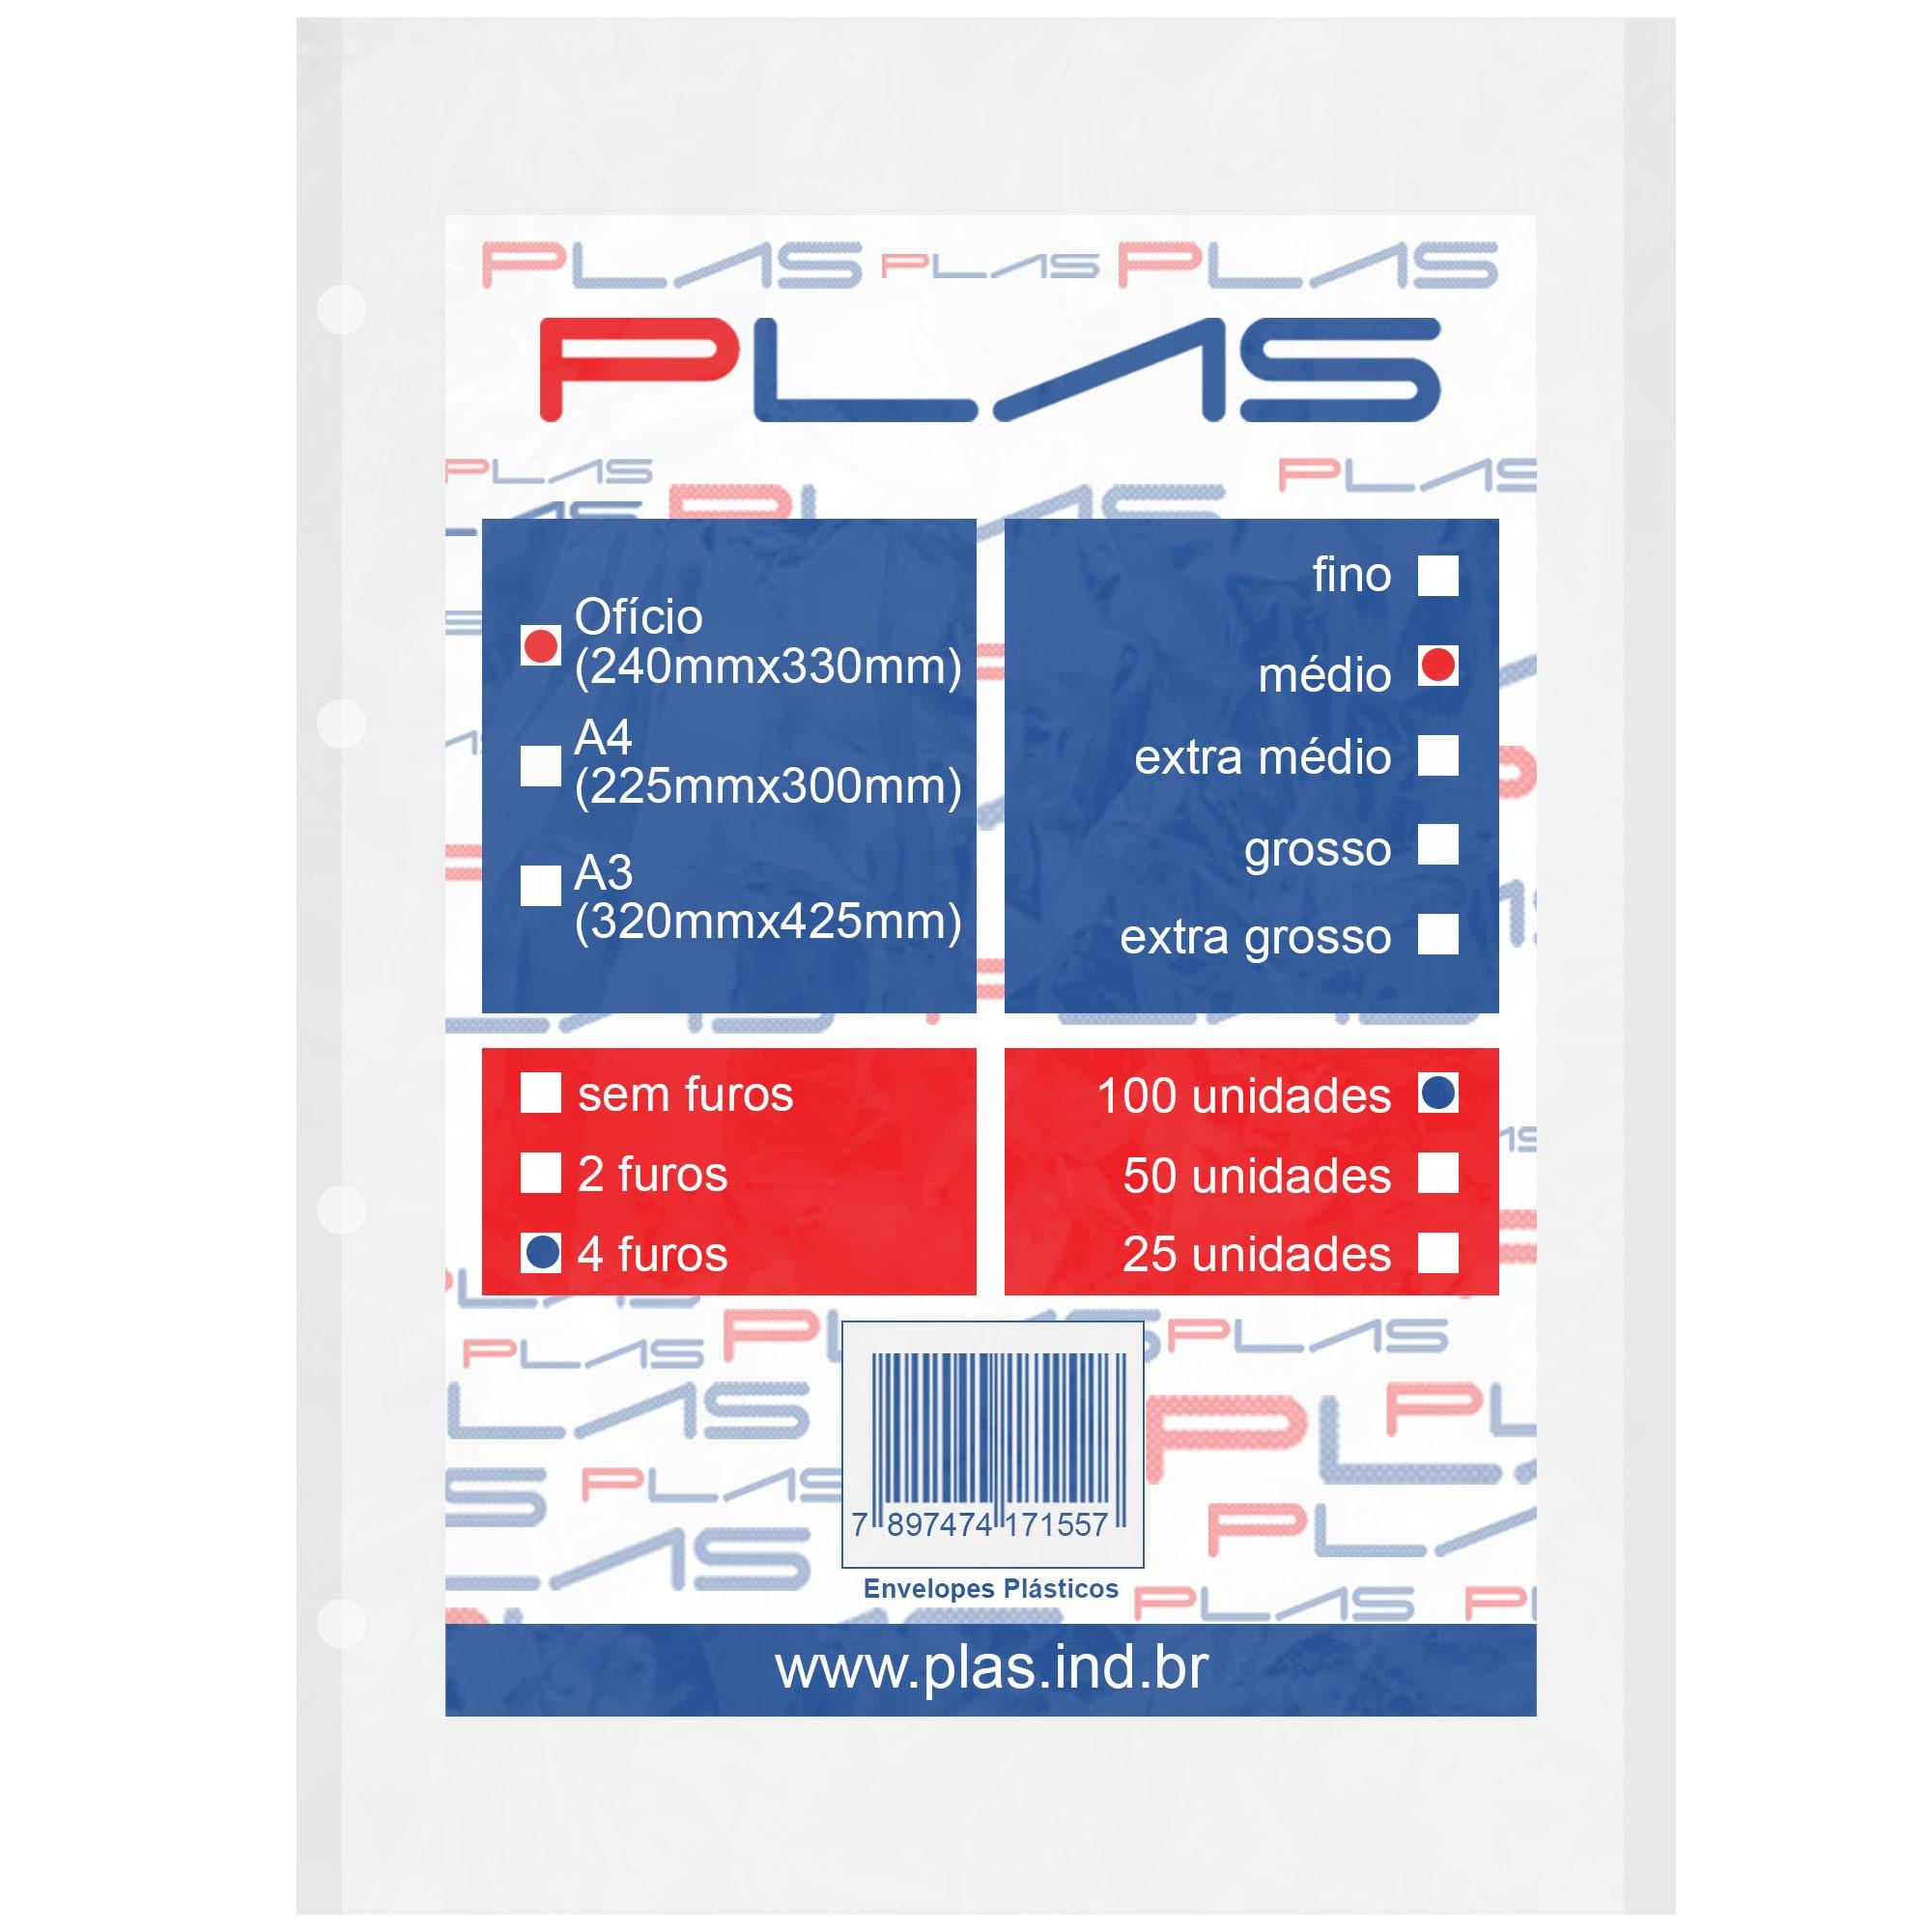 Envelope Saco Plastico tamanho Oficio 4 furos Medio pct c/ 100 un - Iplas